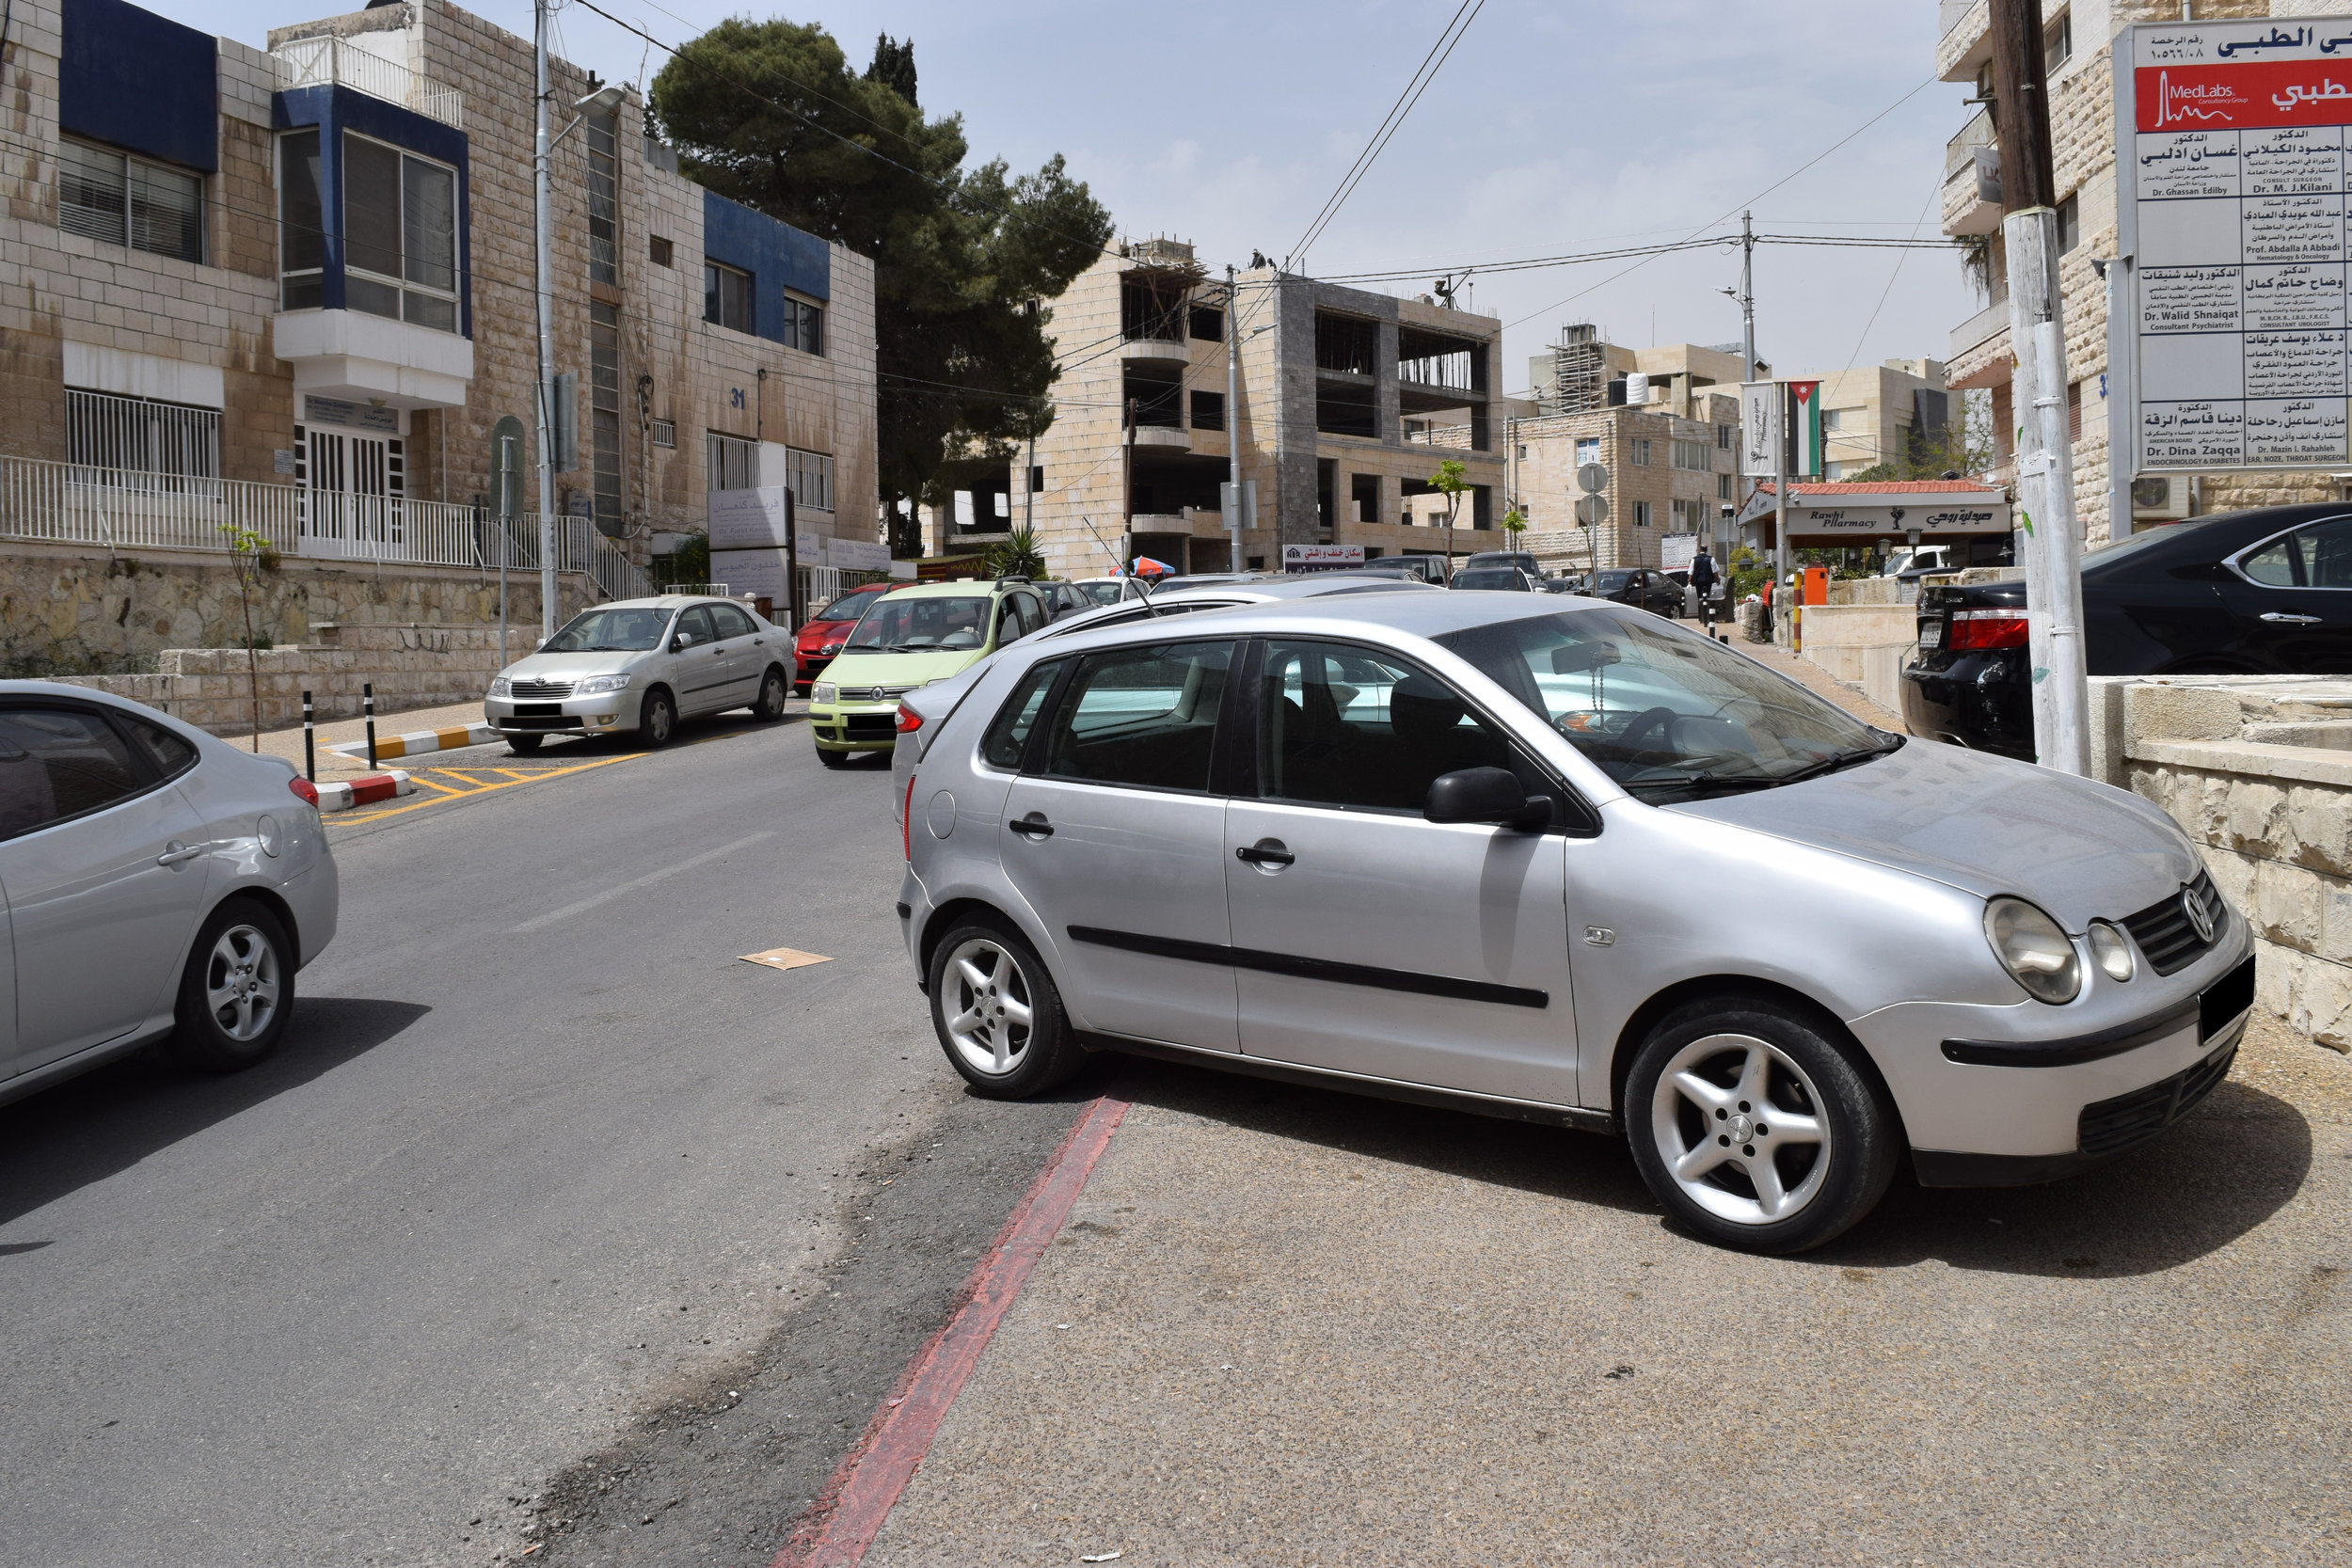 A car parked on the sidewalk.